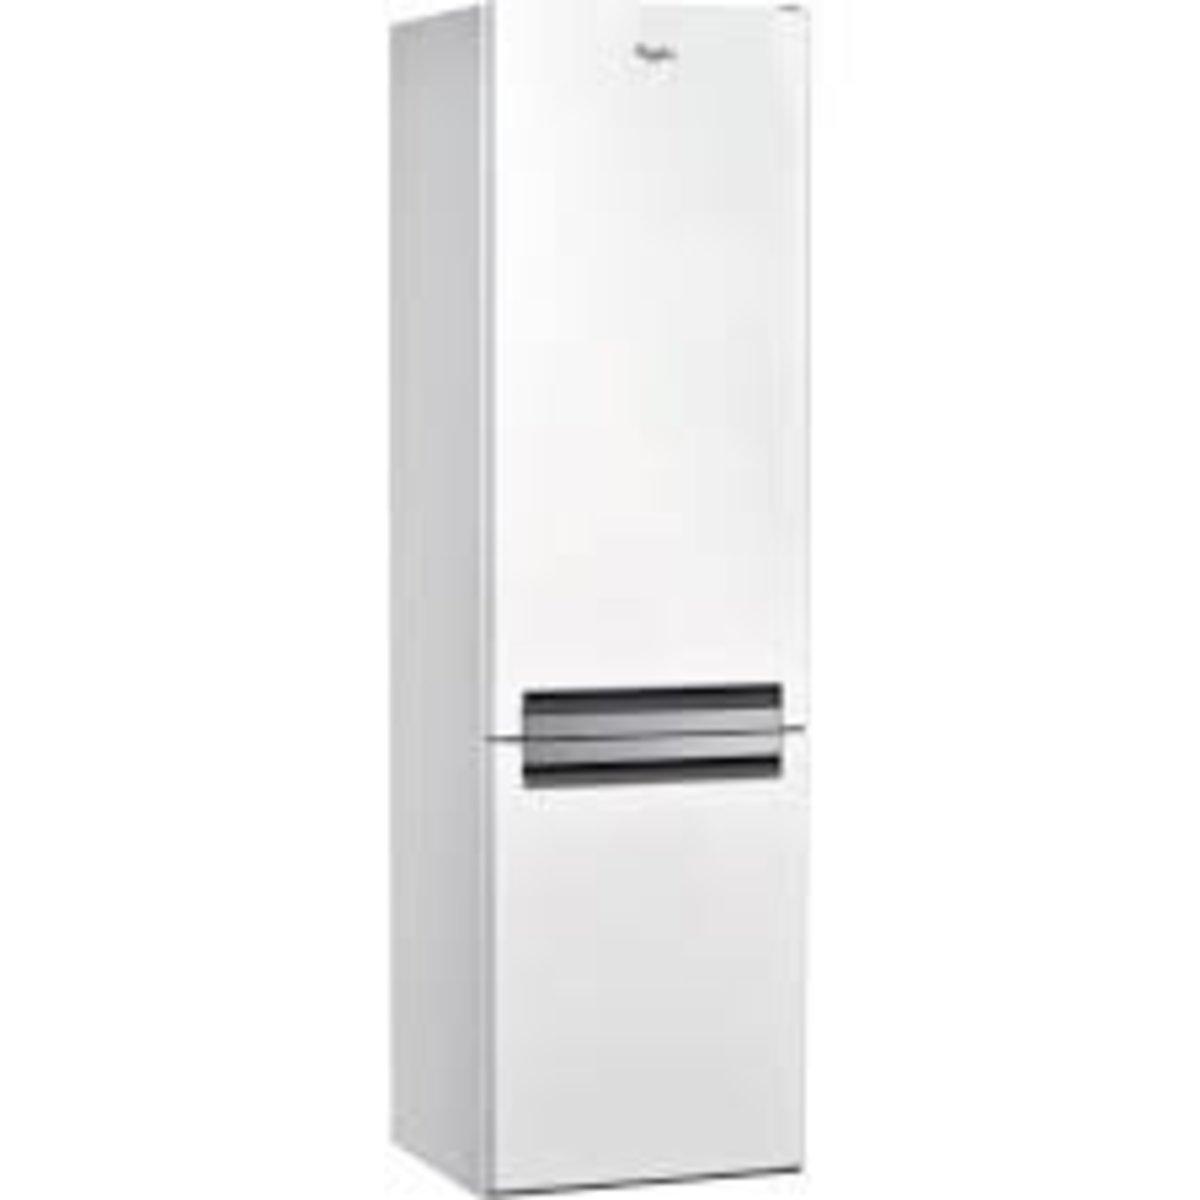 2 Door Refrigerator 296L (Bottom Freezer) BSNF8783OX